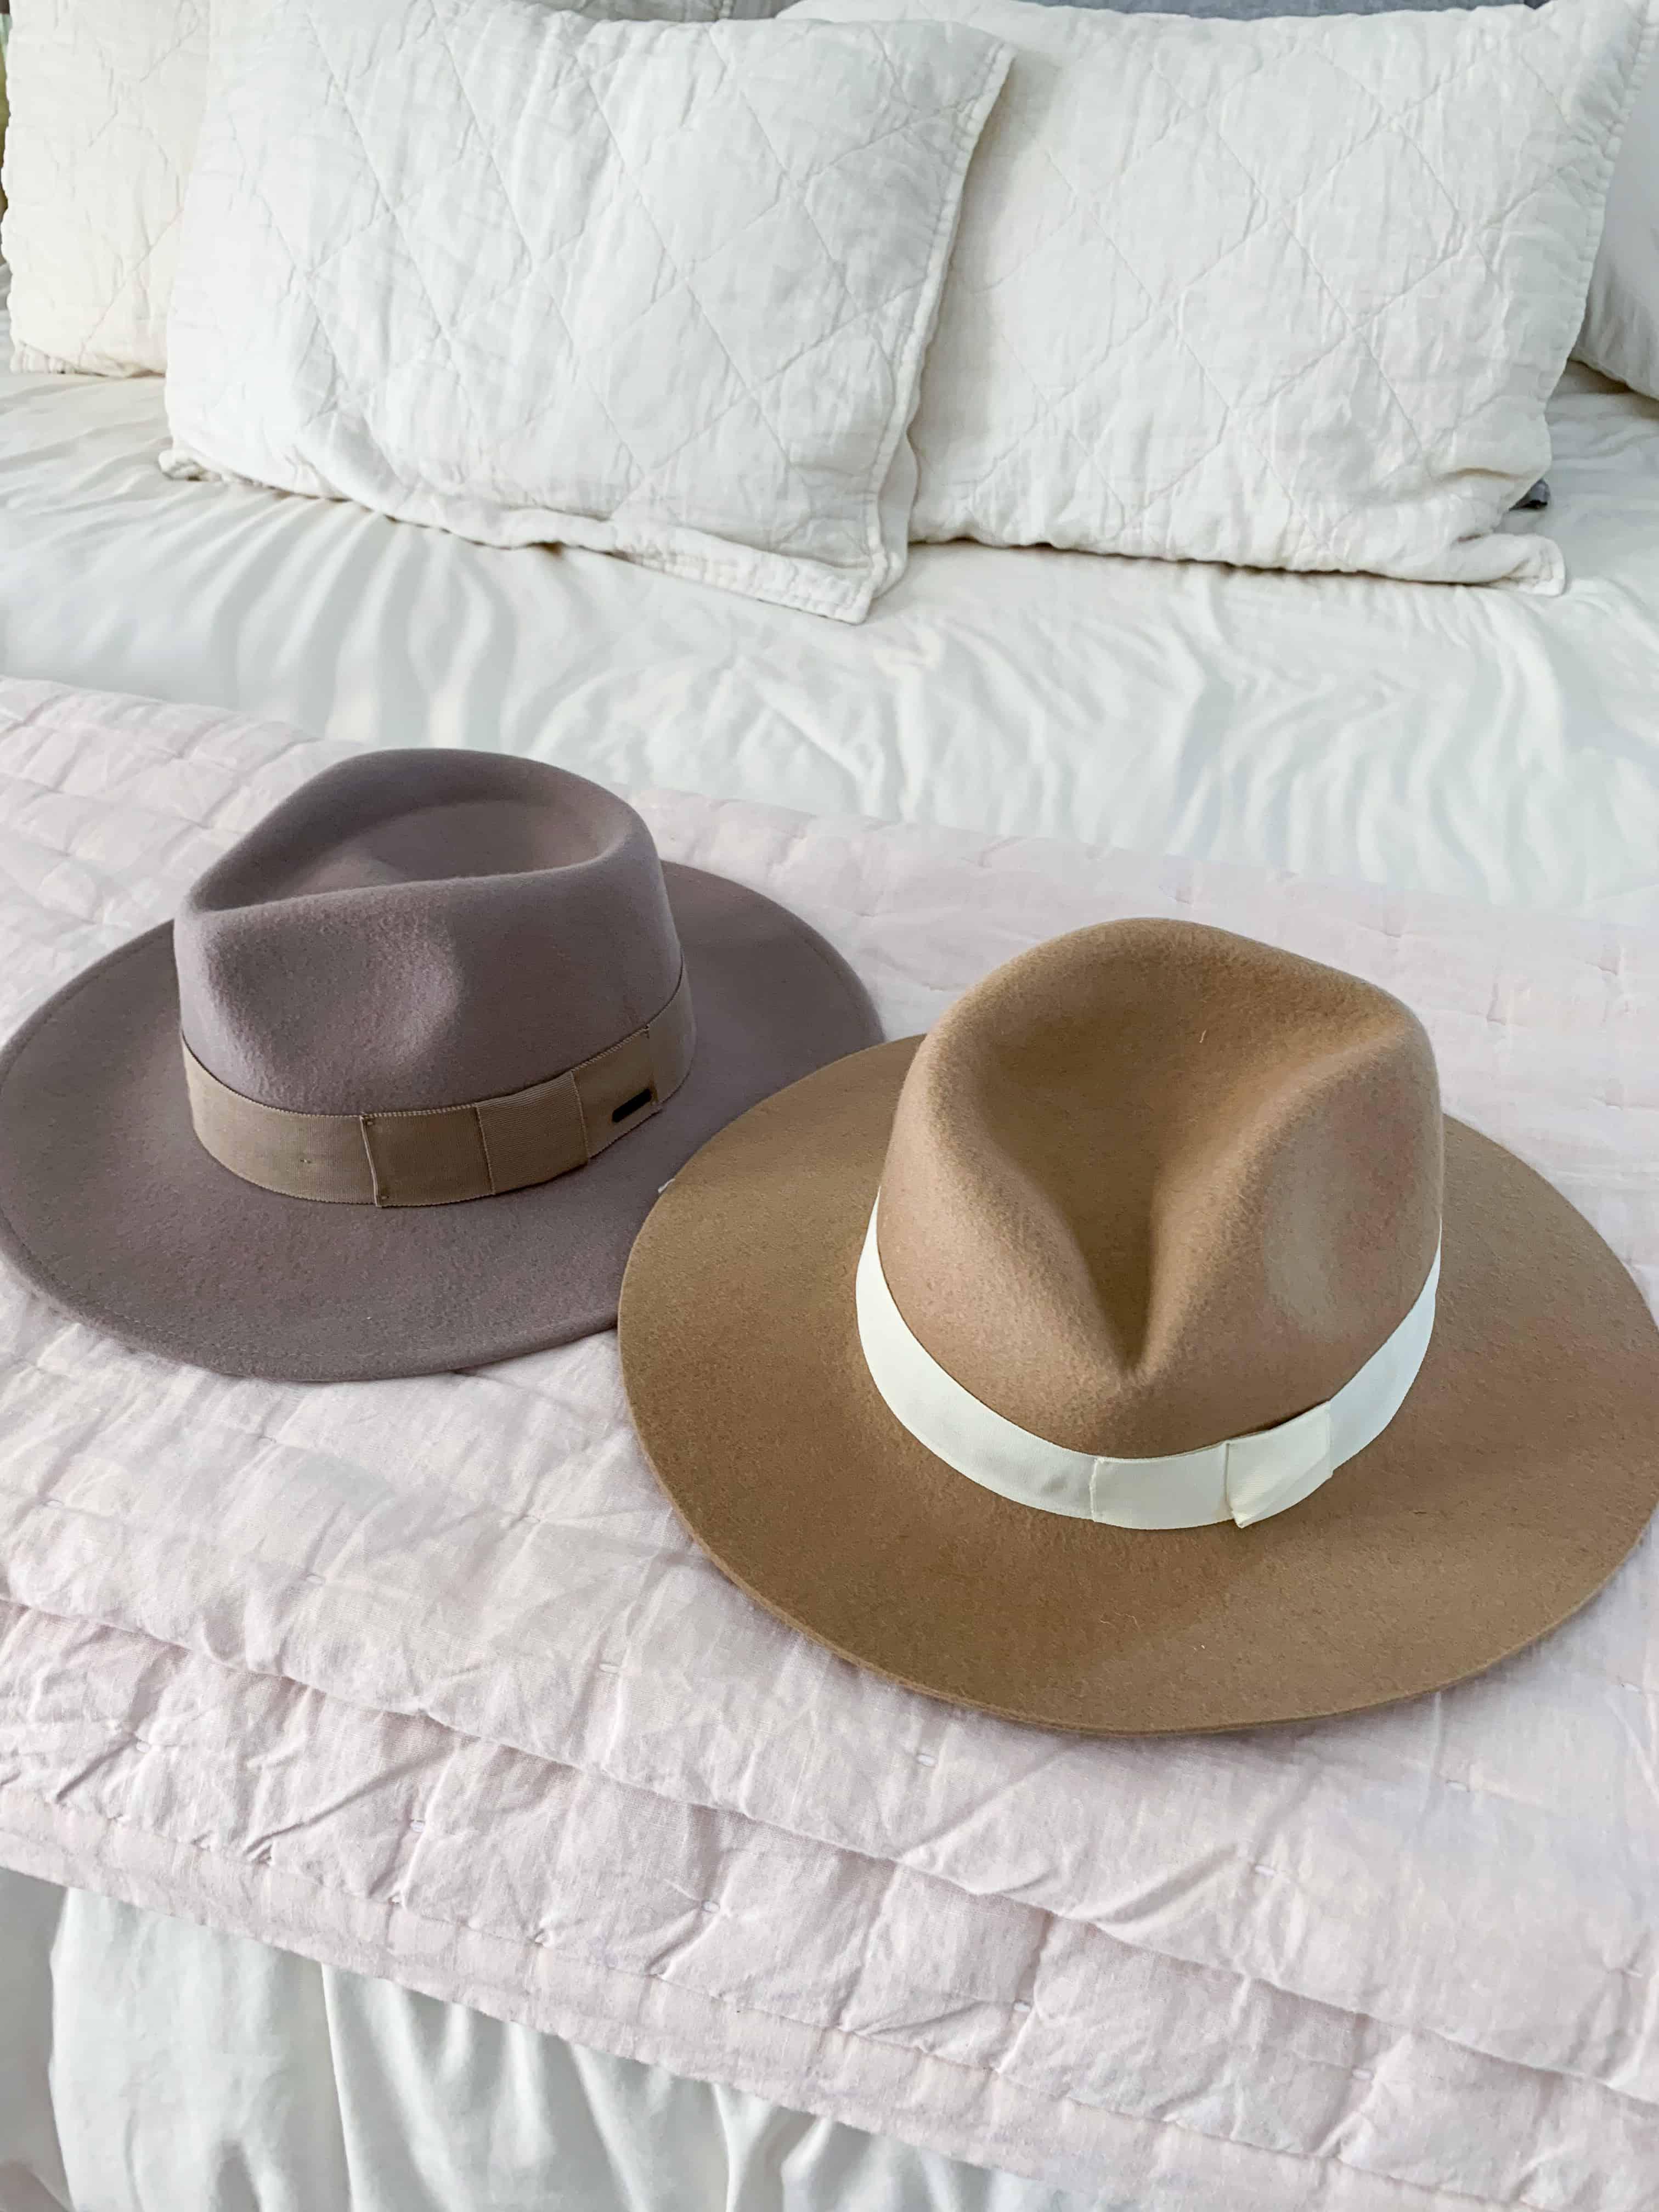 Katies Bliss Wool Hats